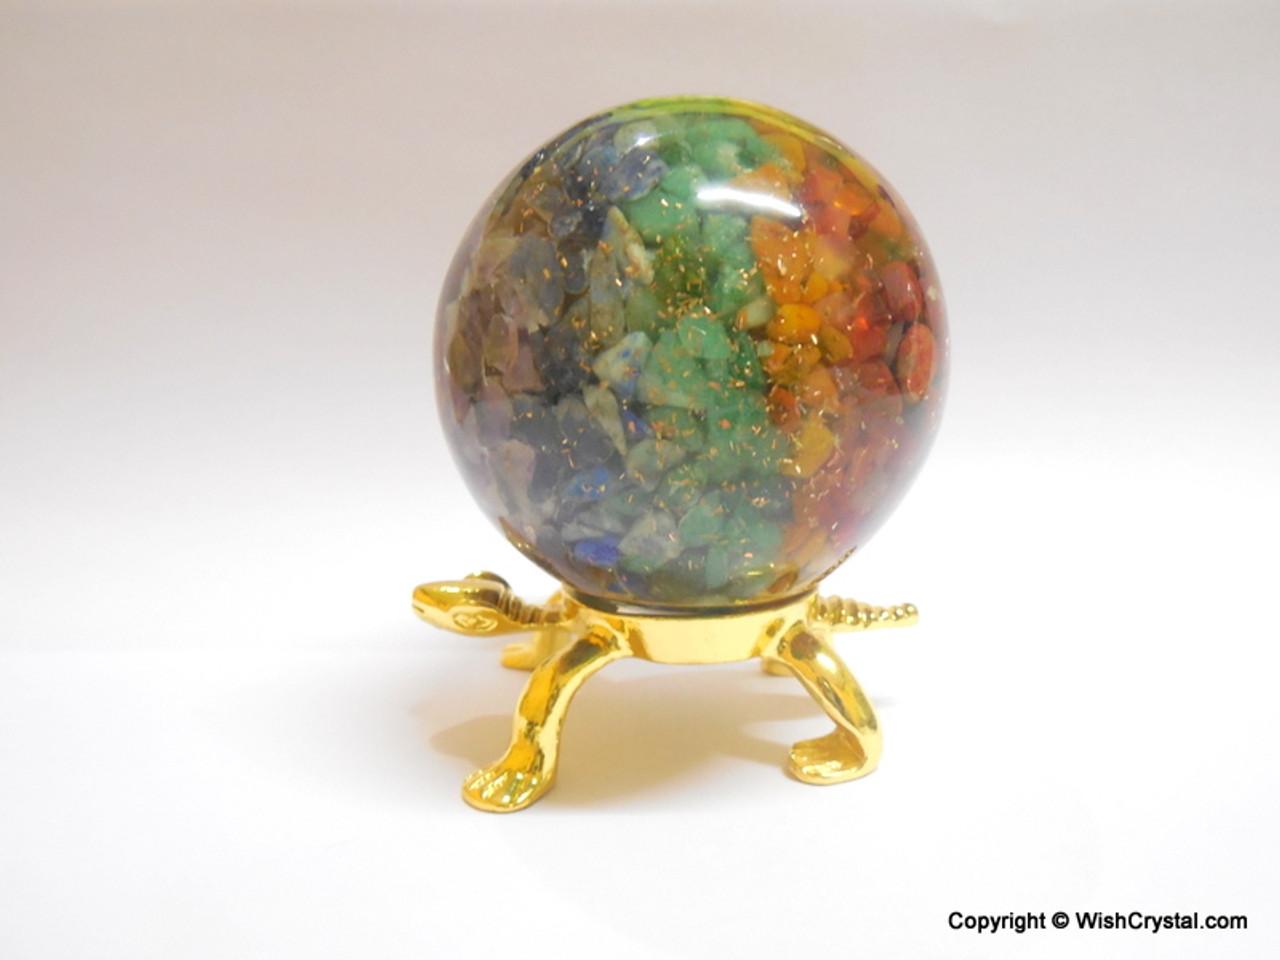 Chakra Stones Layered Orgonite Sphere EMF Protection Healing